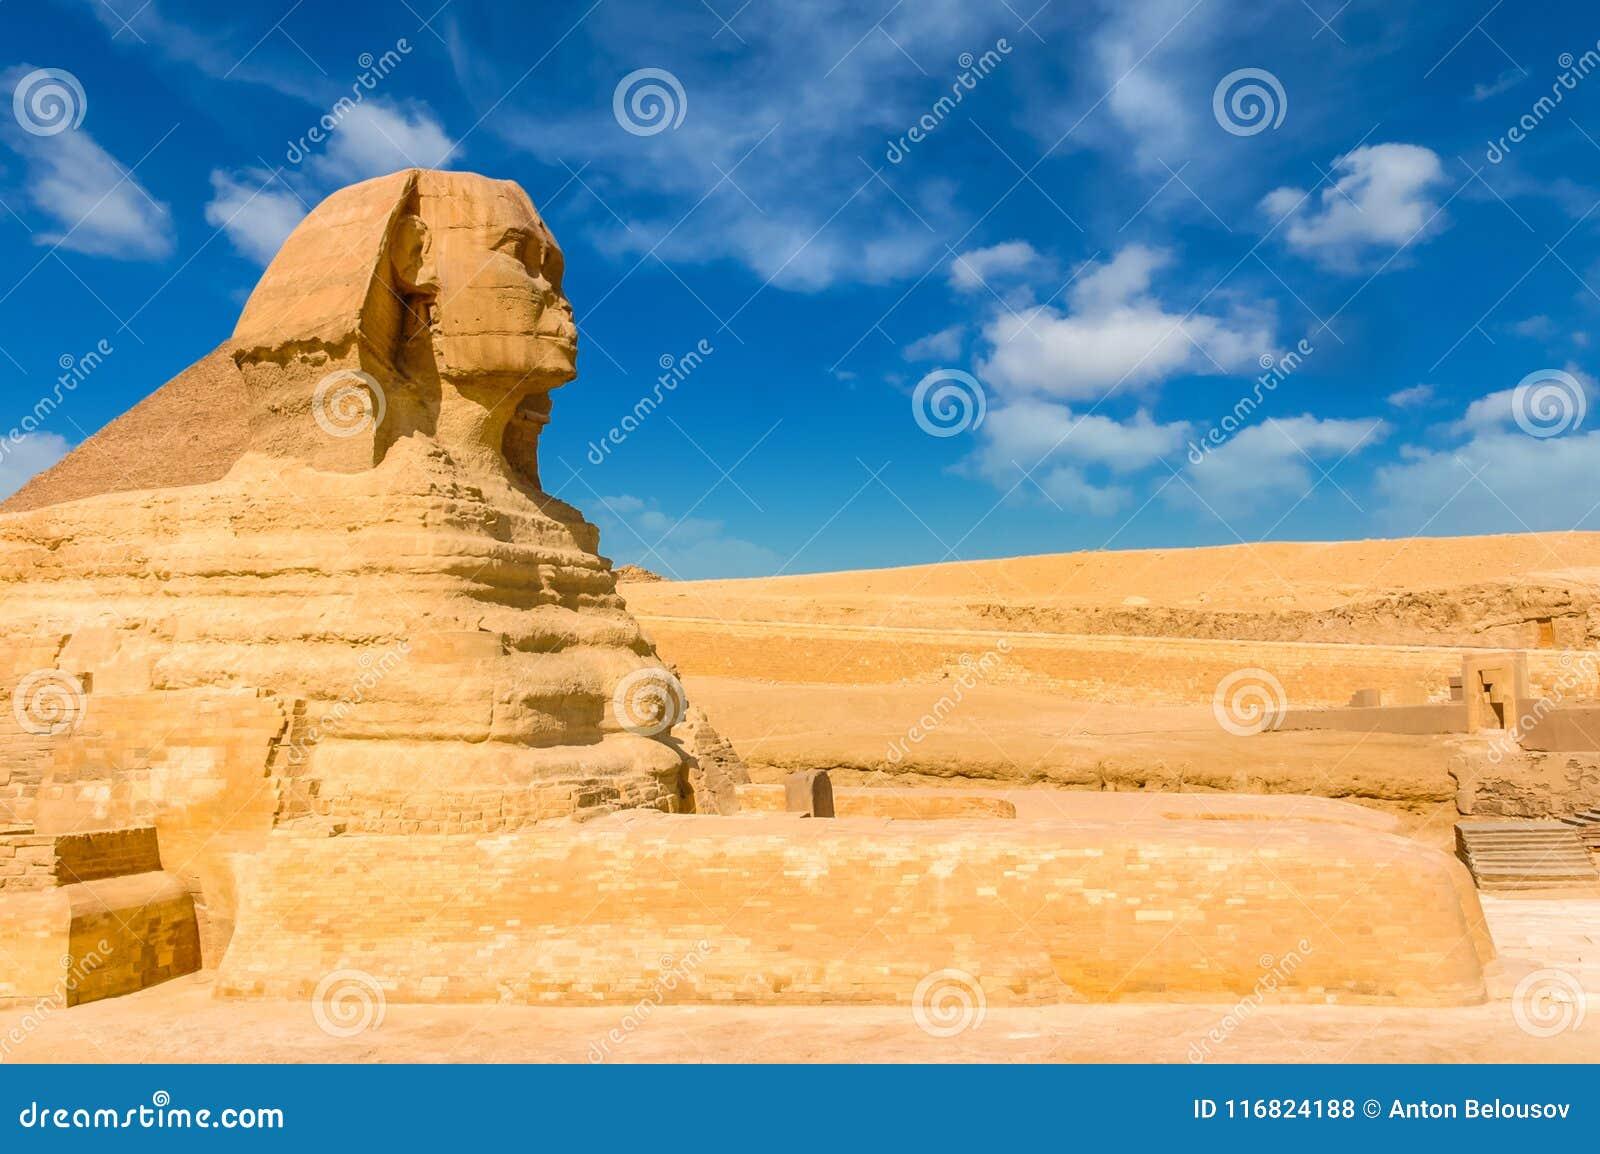 Sphinx égyptien cairo giza Égypte fond plus de ma course de portefeuille Architec